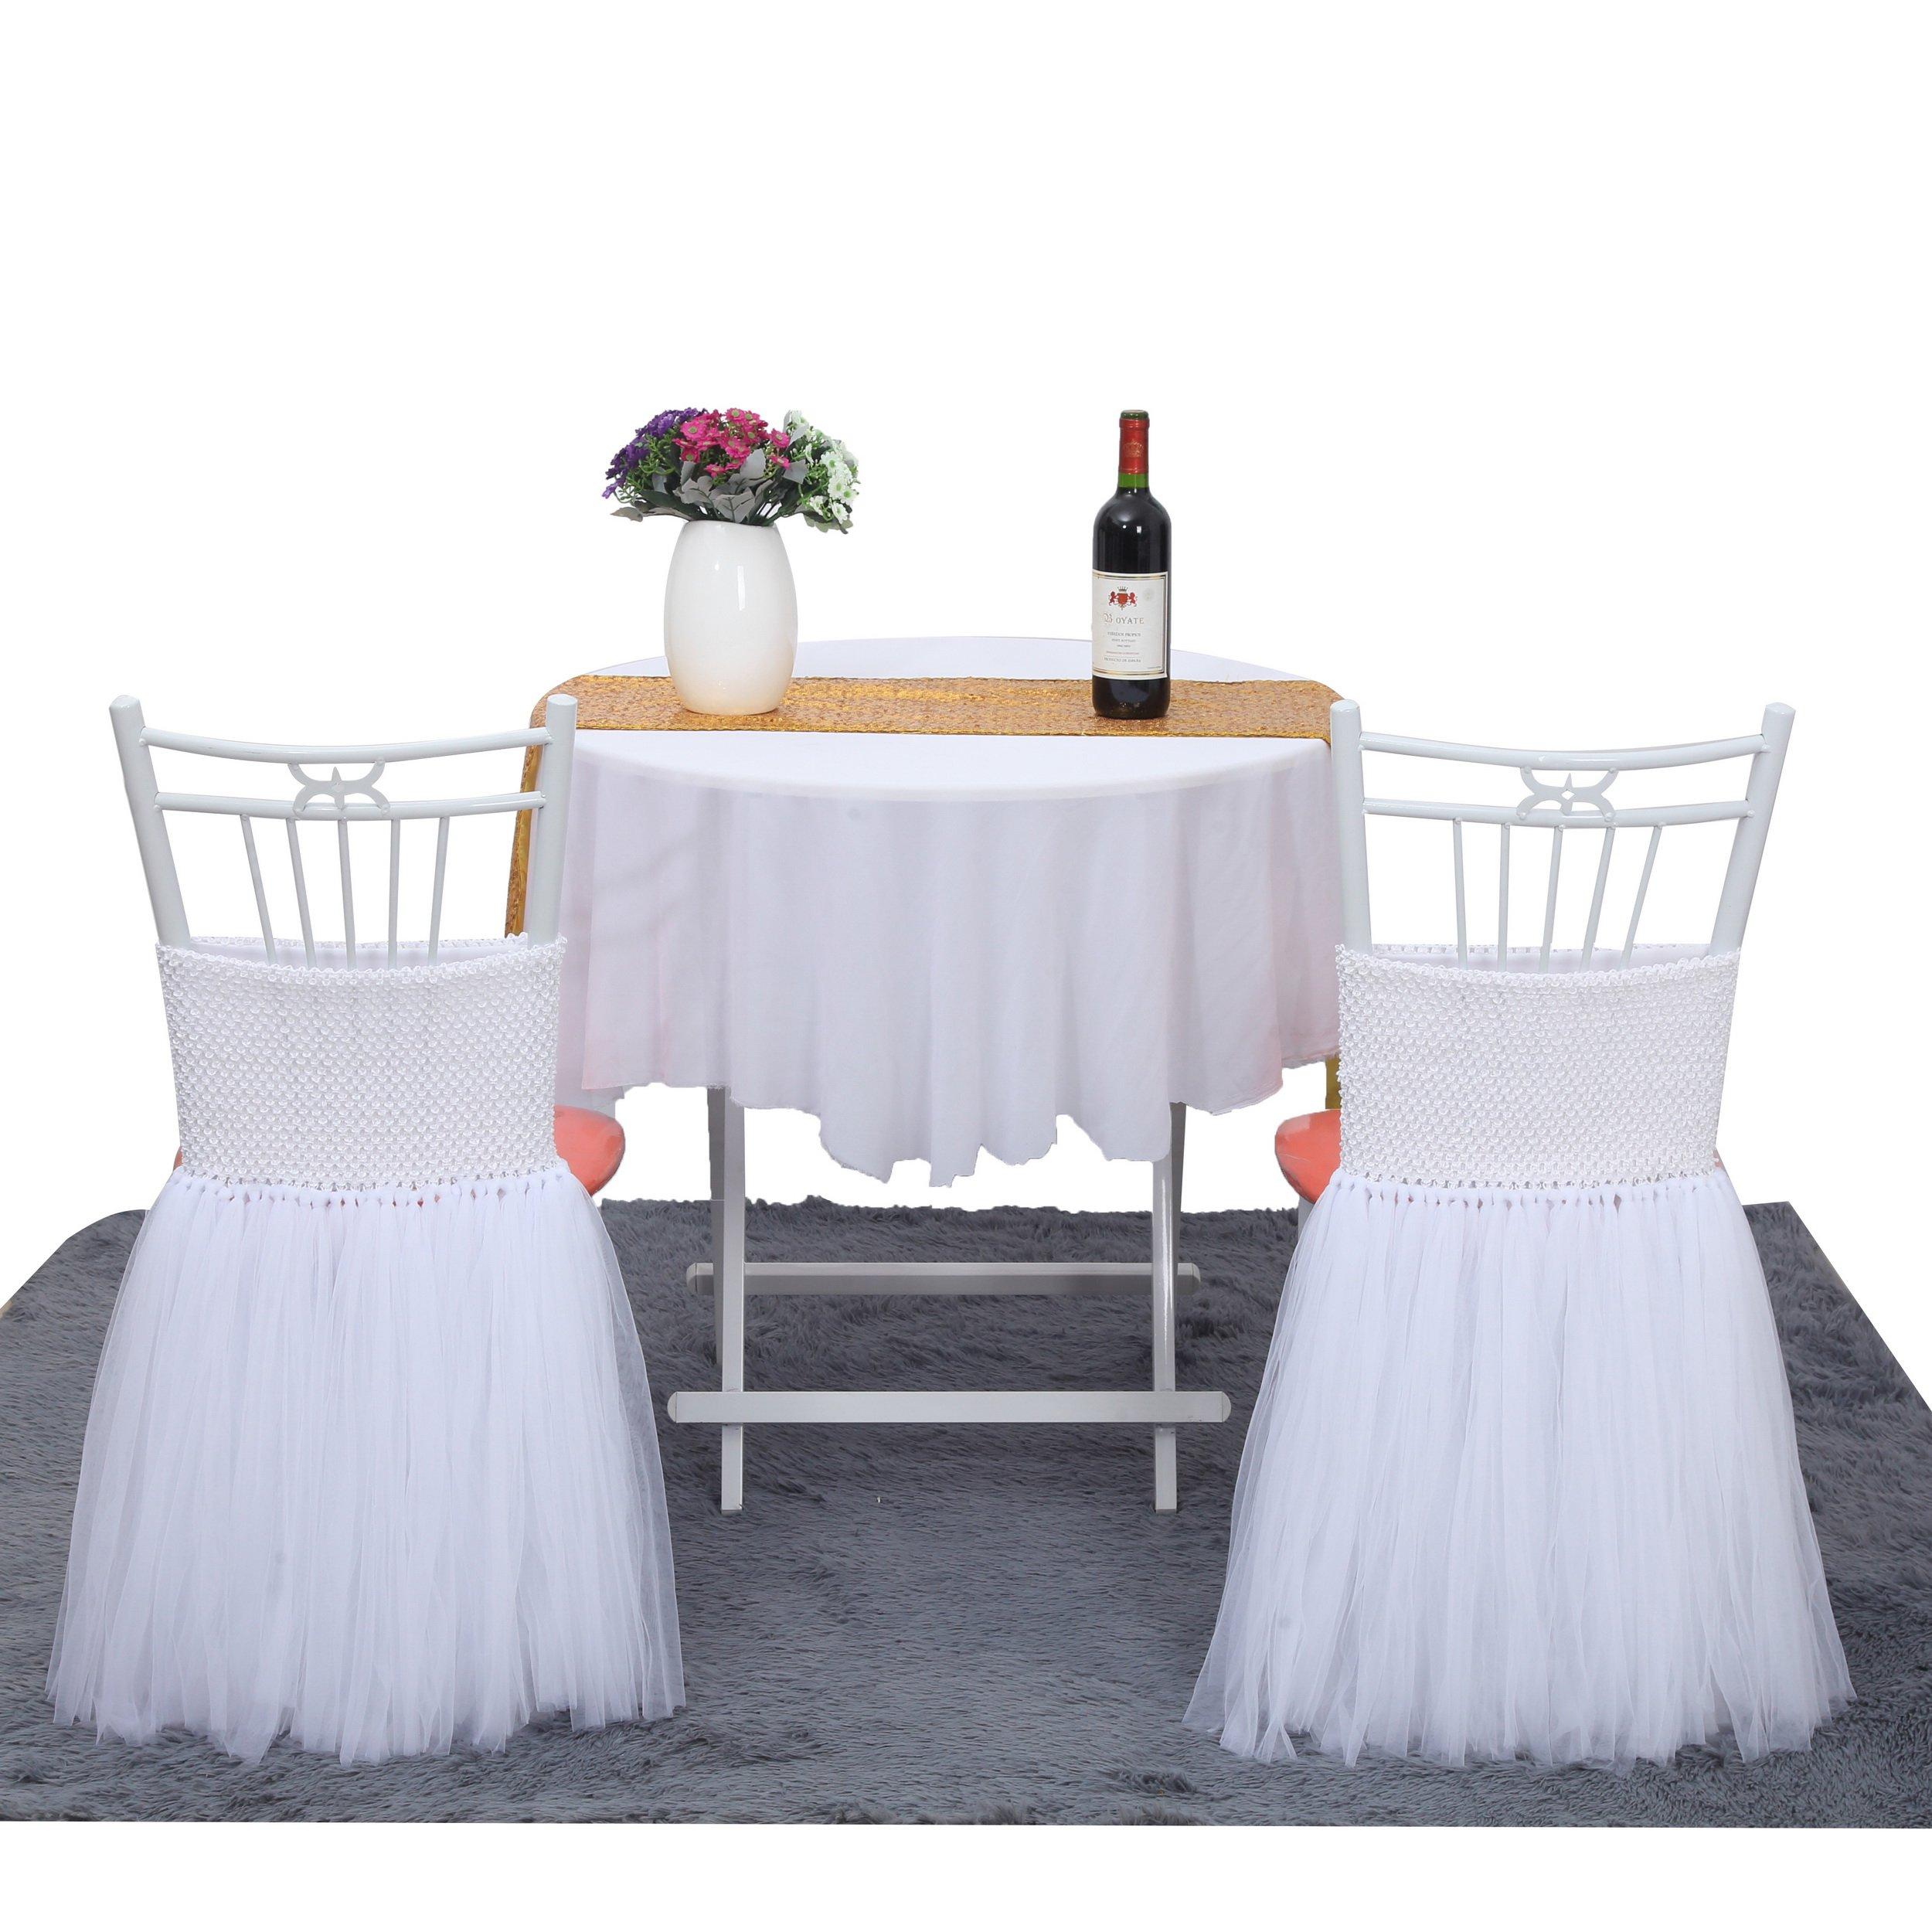 Suppromo Fluffy Tutu Chair Skirt Gold Brim Slipcovers White Handmade Chair Tutu Skirt For Baby Shower,Bridal Shower,Birthday Party&Home Decoration